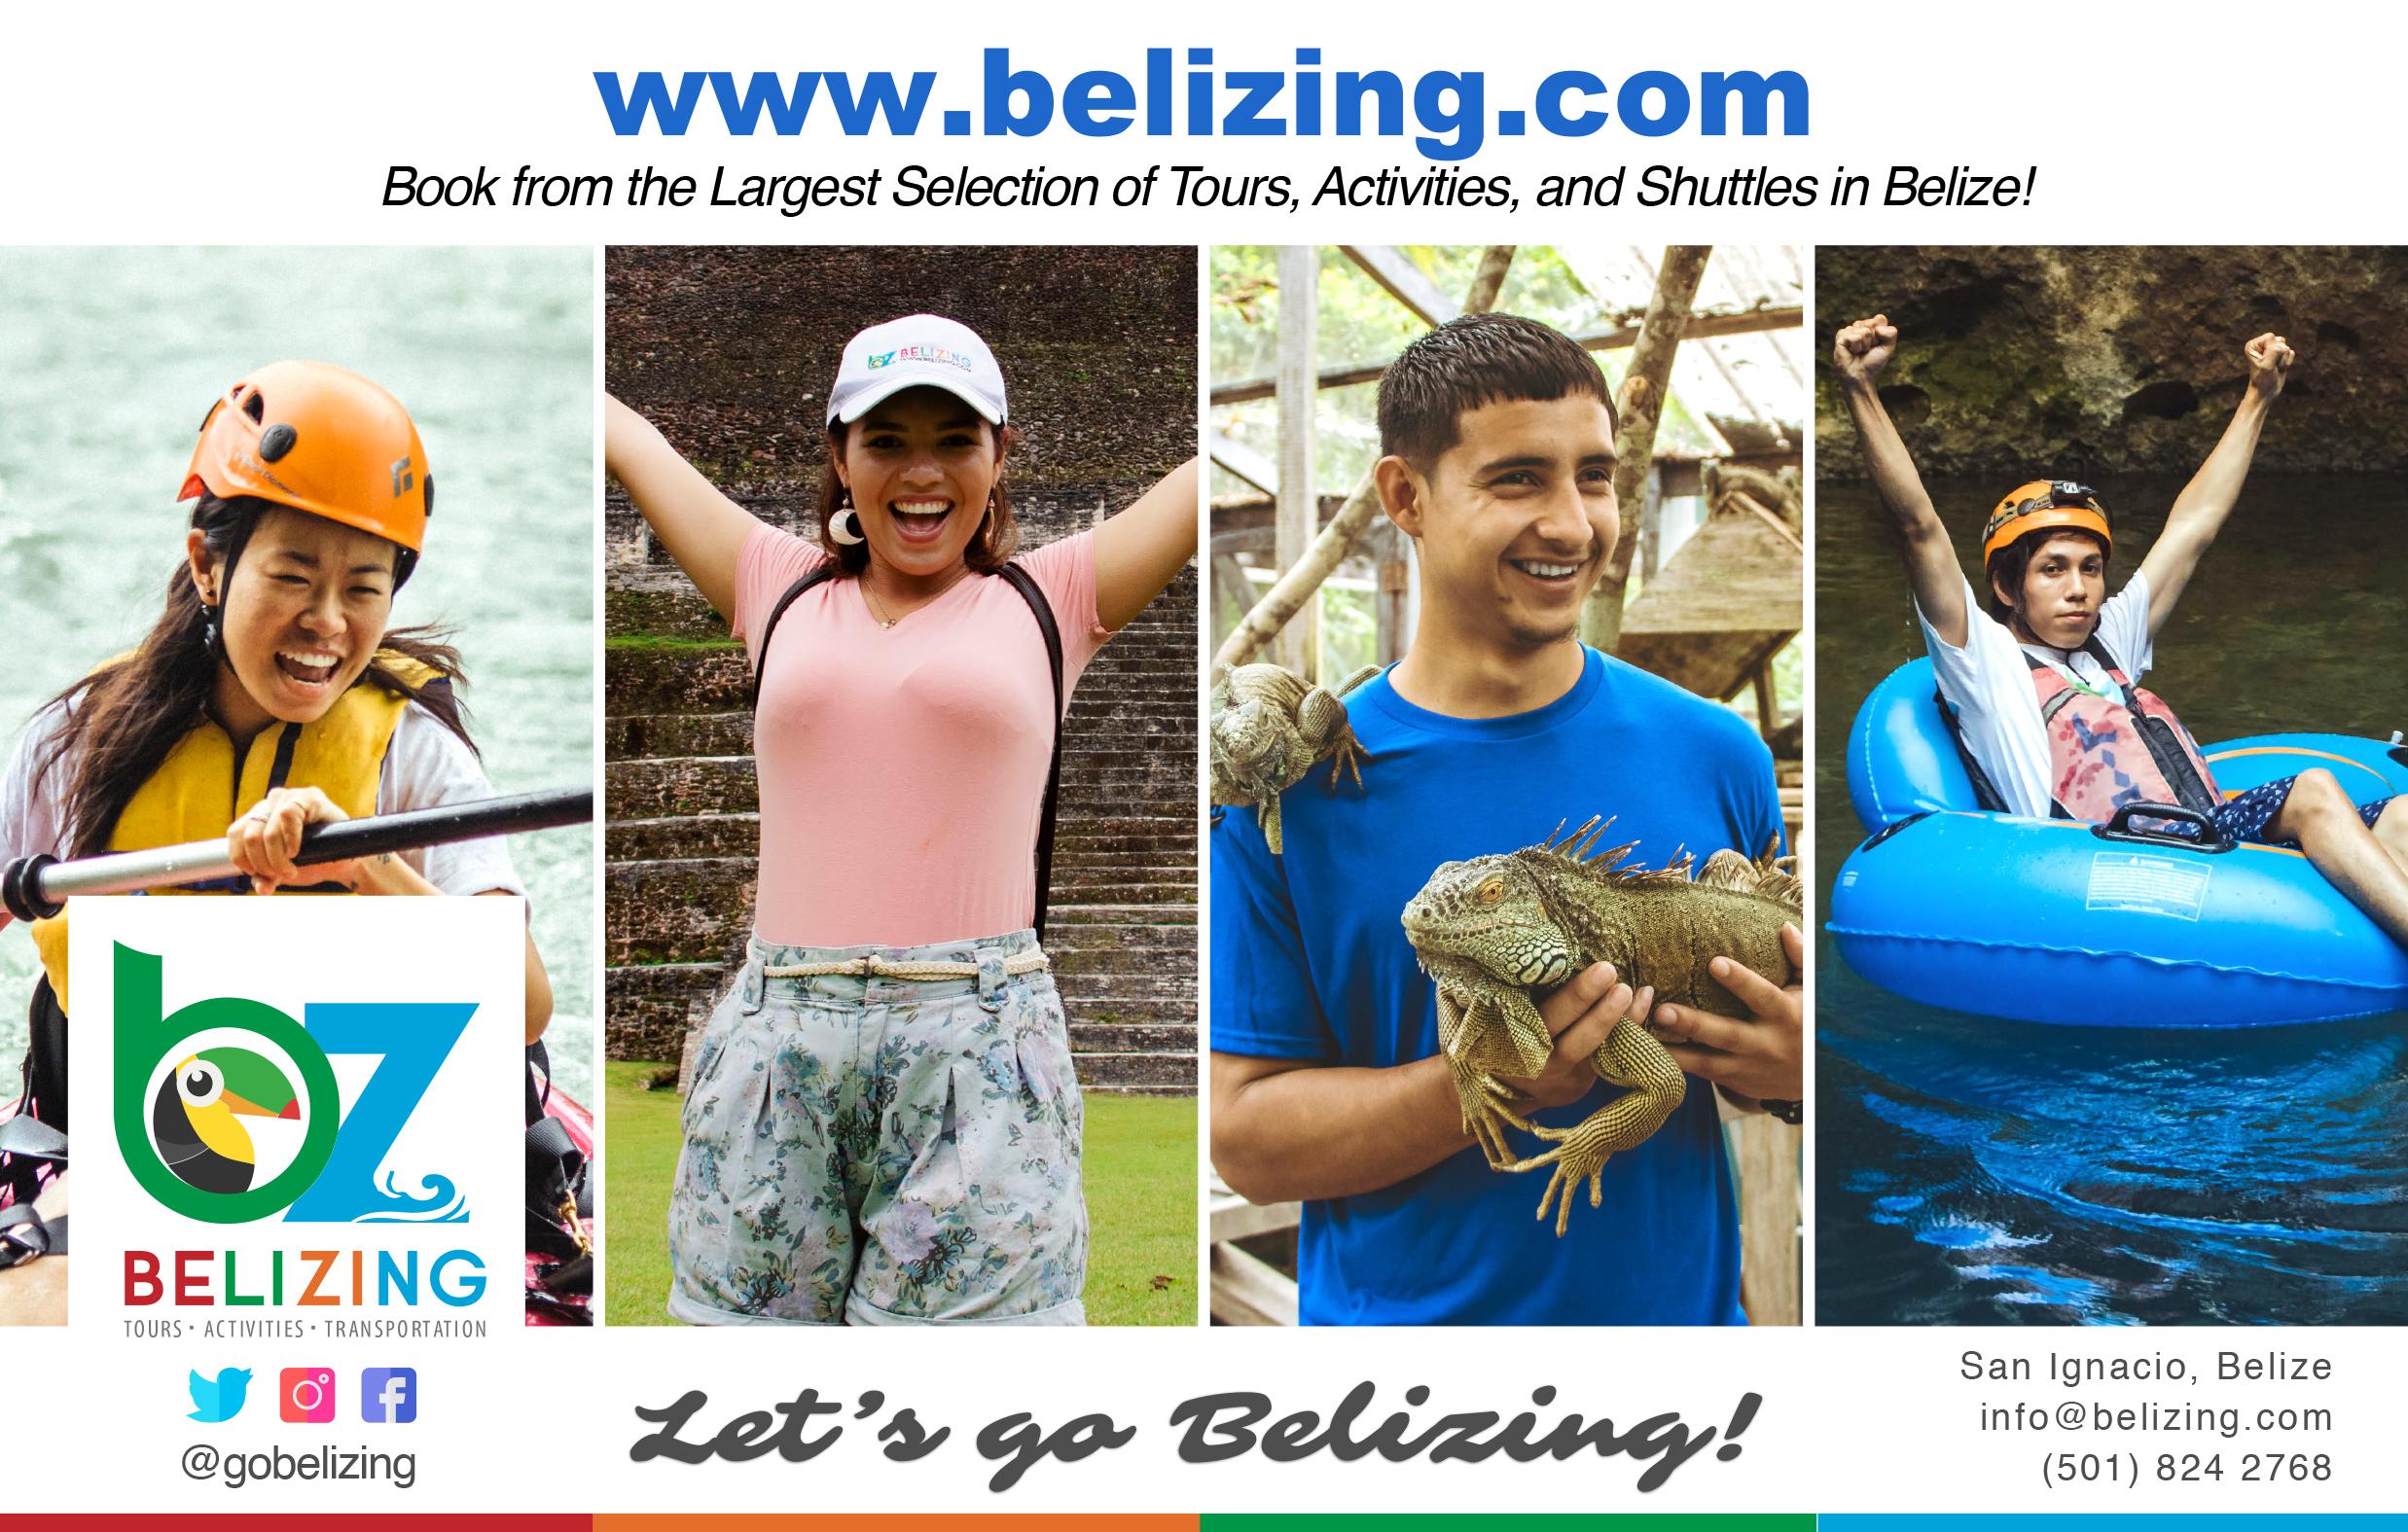 Belizing